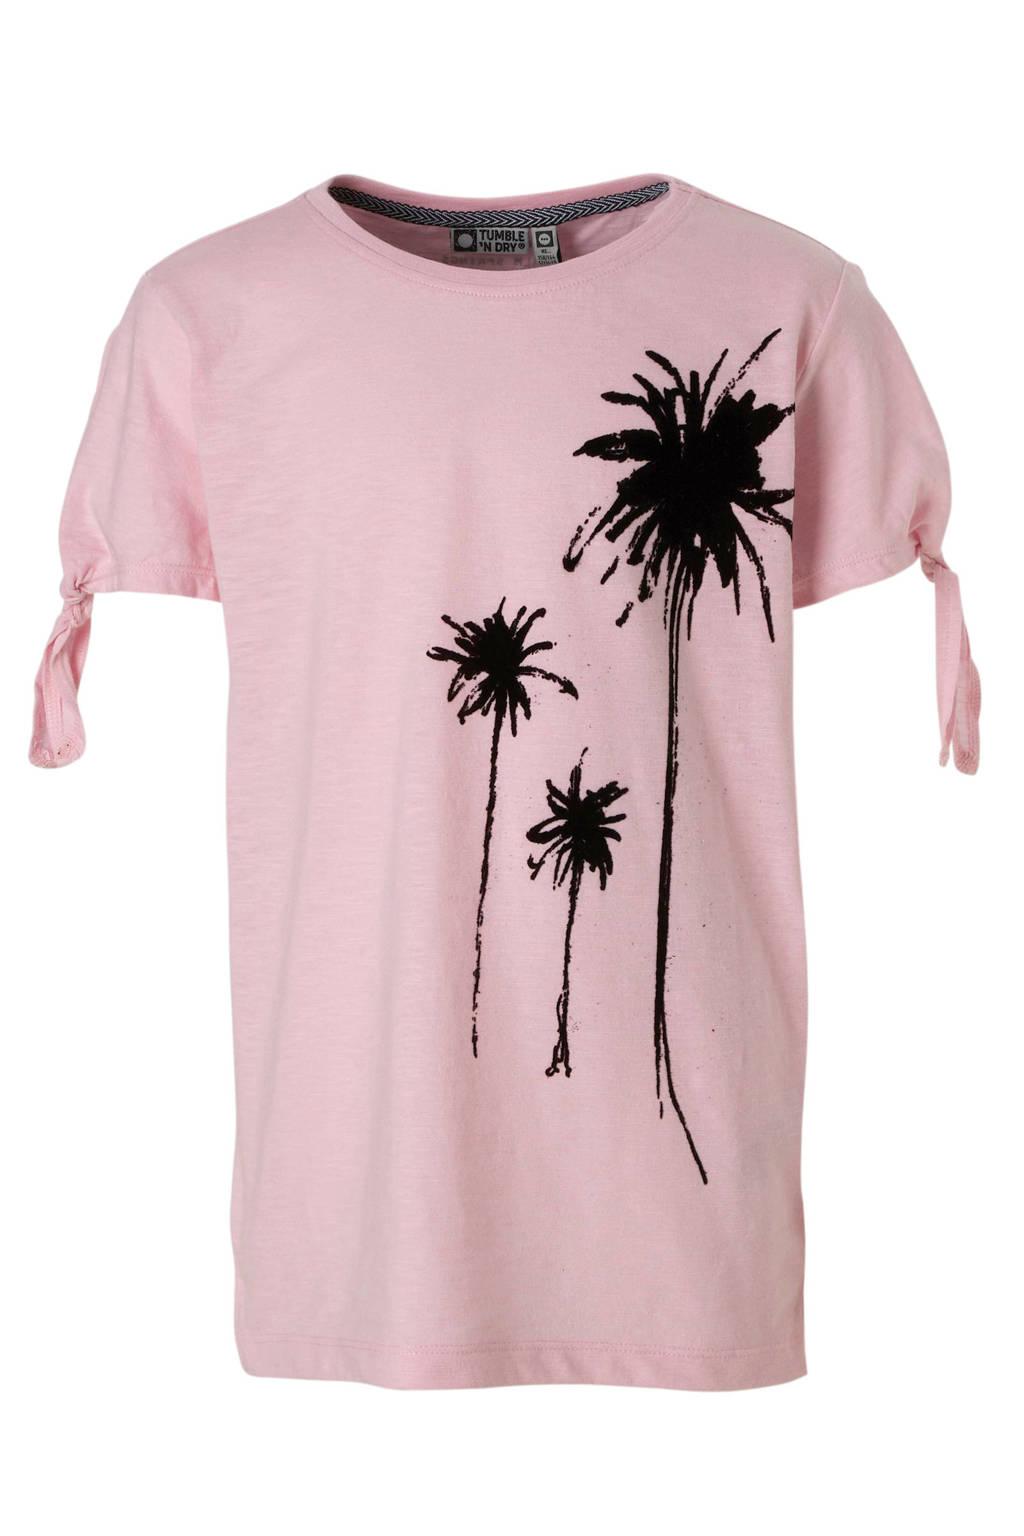 Tumble 'n Dry Hi T-shirt met printopdruk roze, Roze/zwart